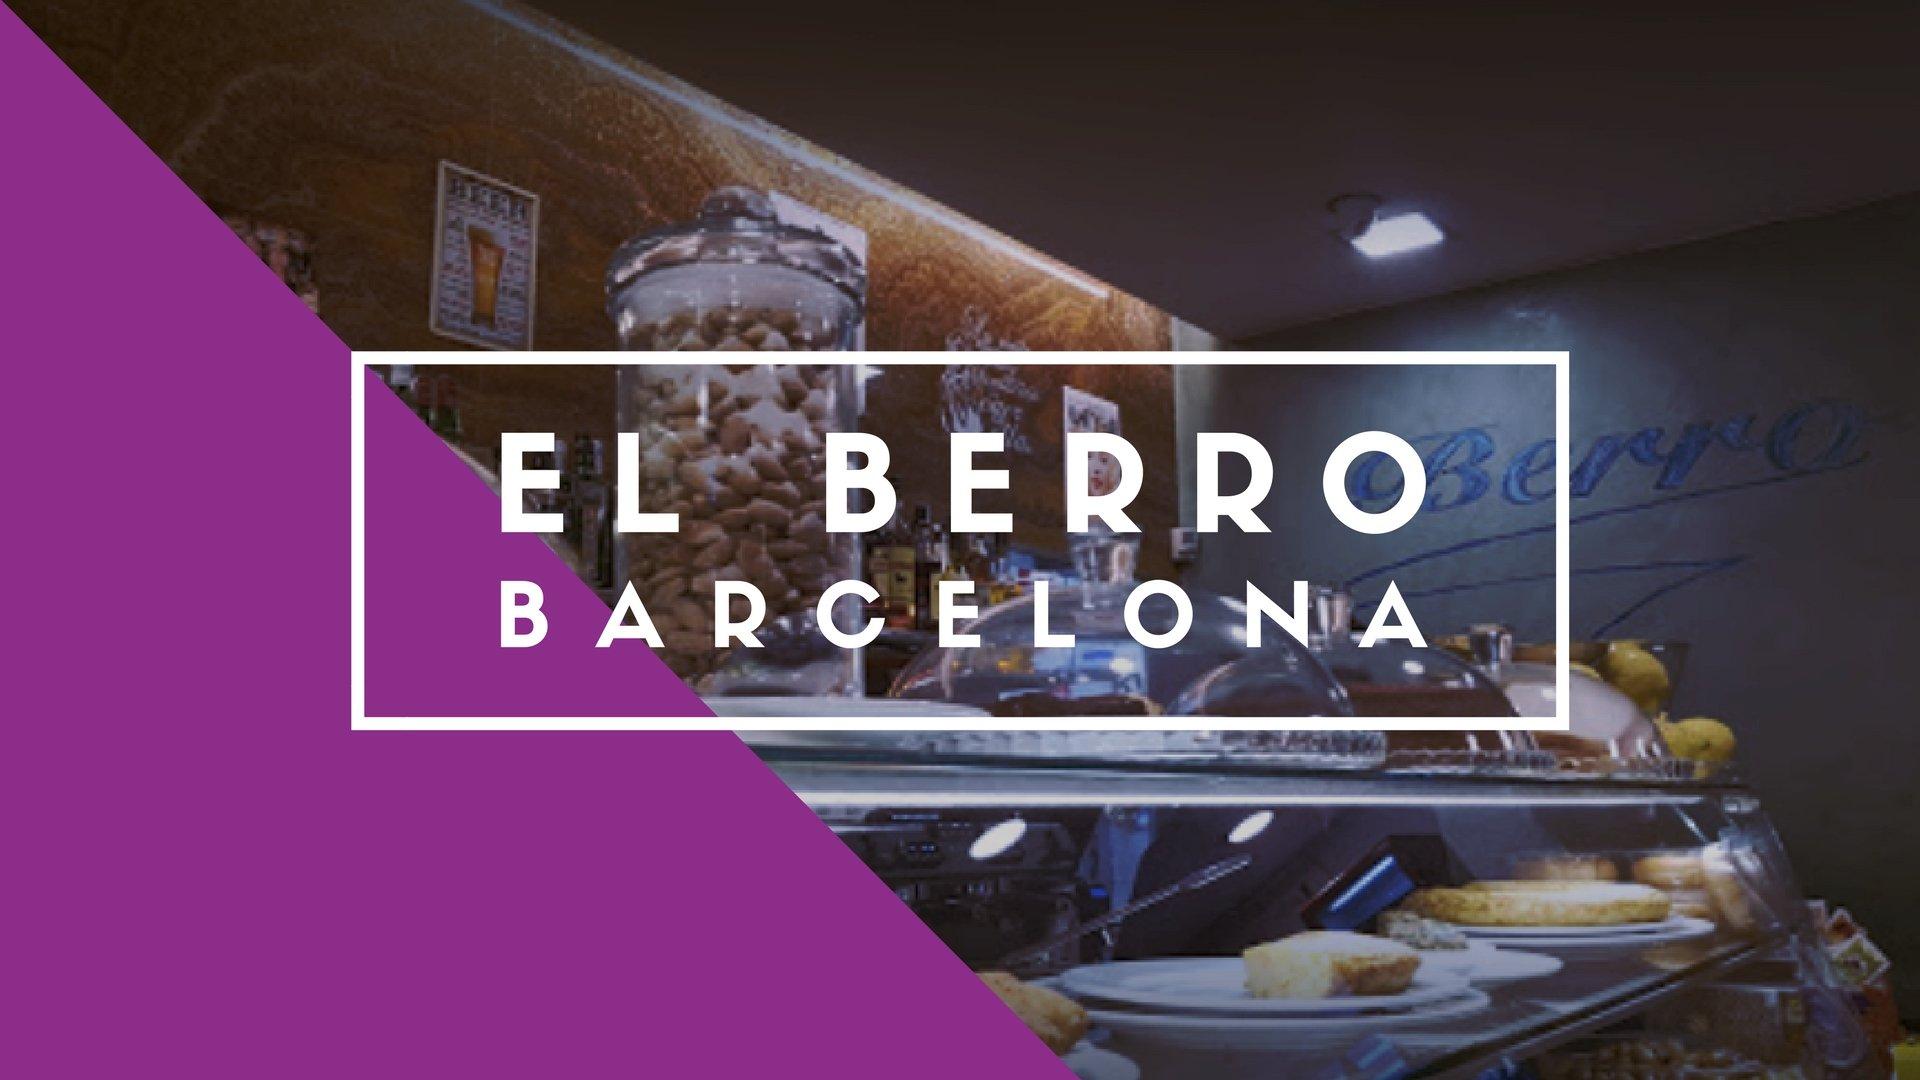 El Berro, Barcelona